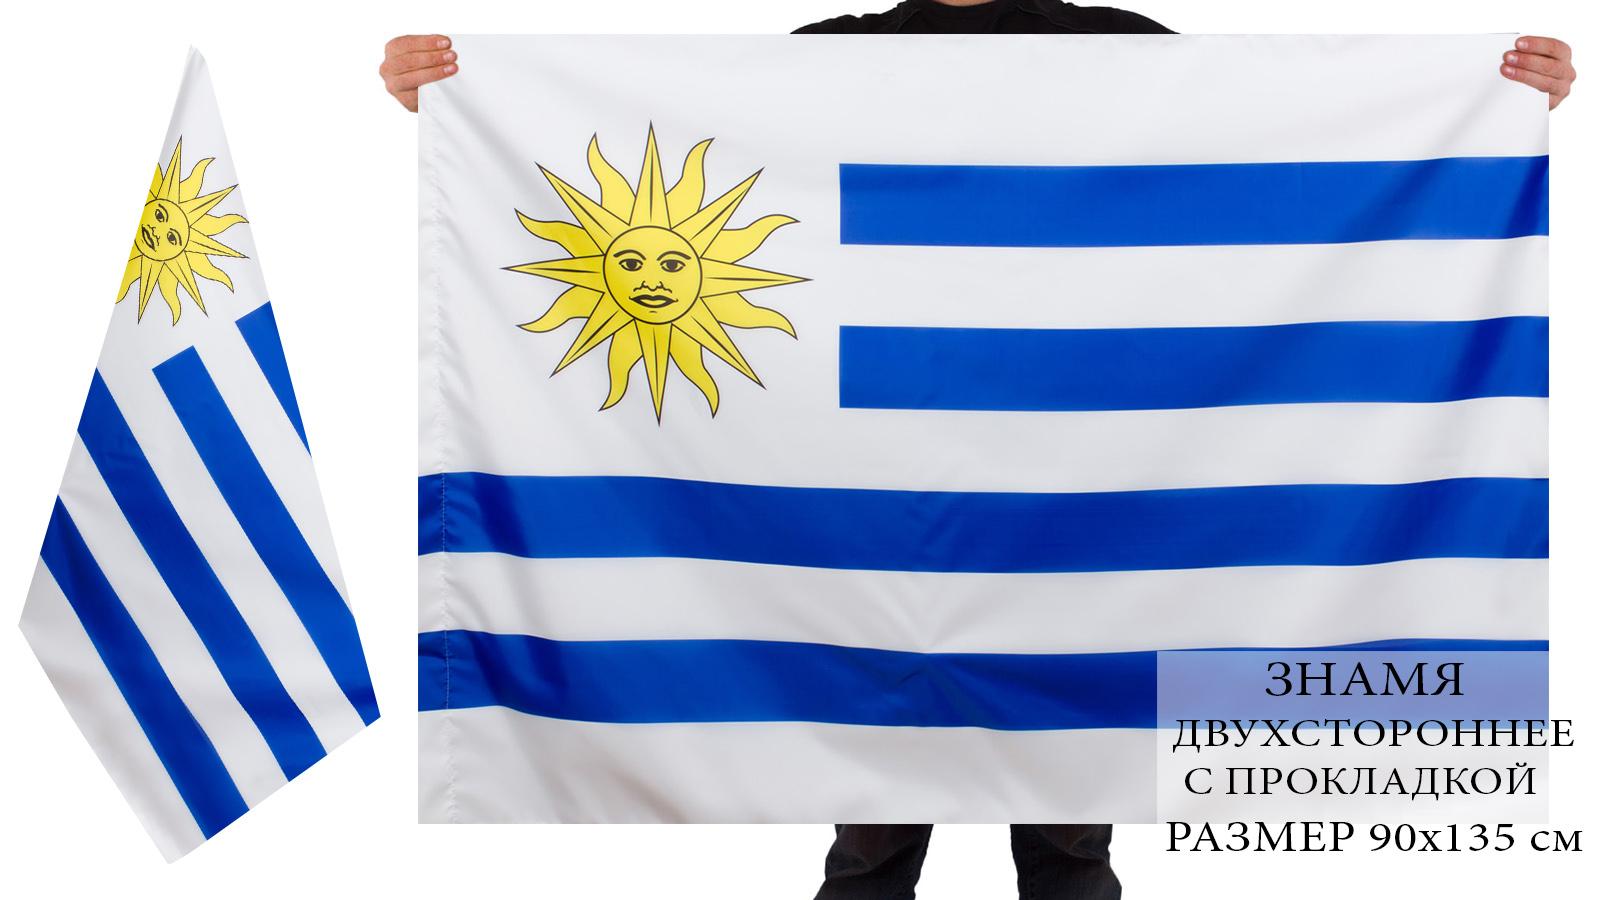 Уругвайский флаг двухсторонний